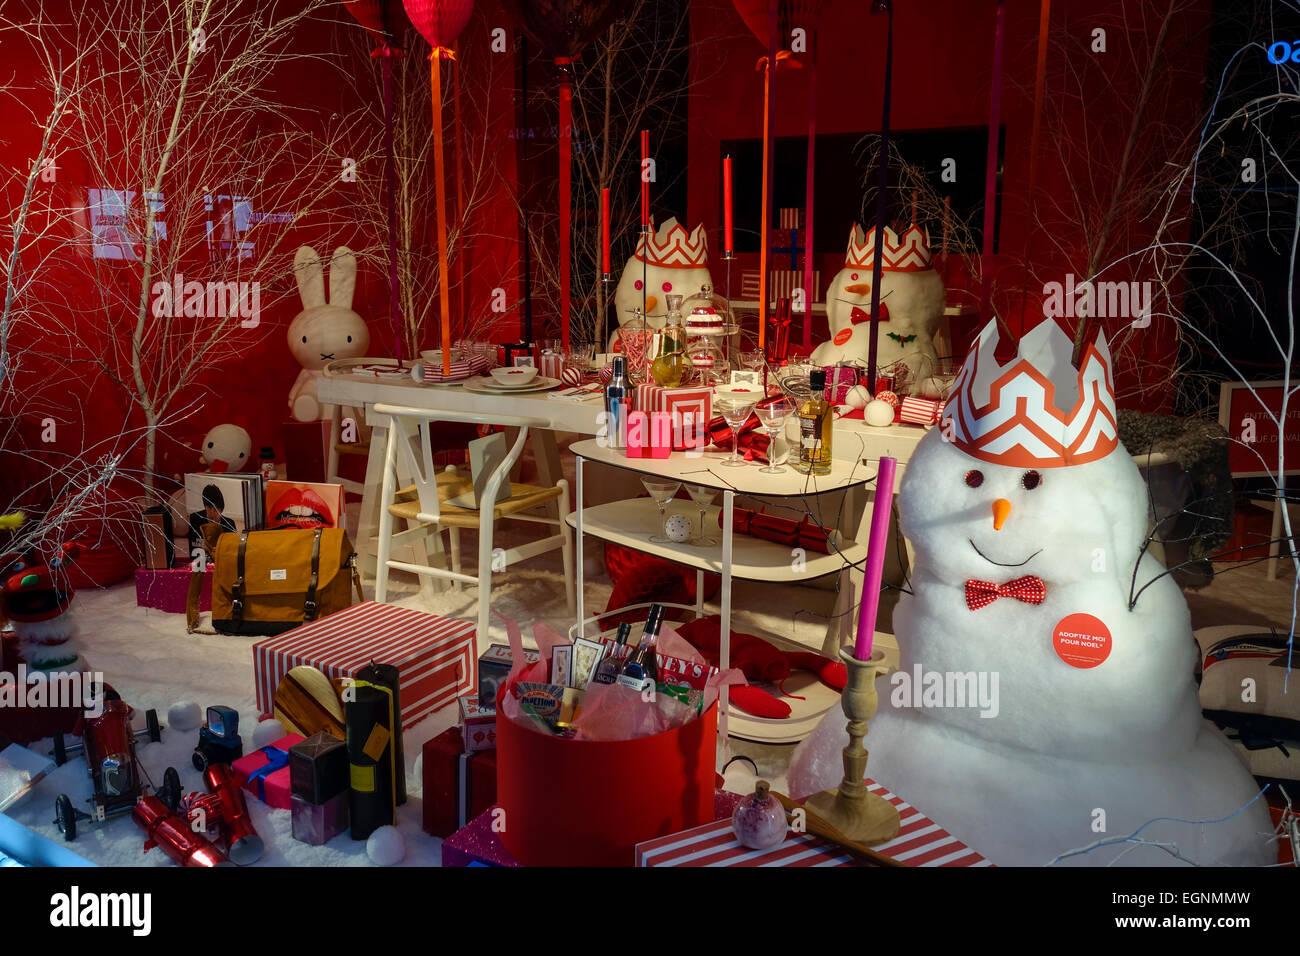 Christmas Shop Windows Paris Stock Photos & Christmas Shop Windows ...